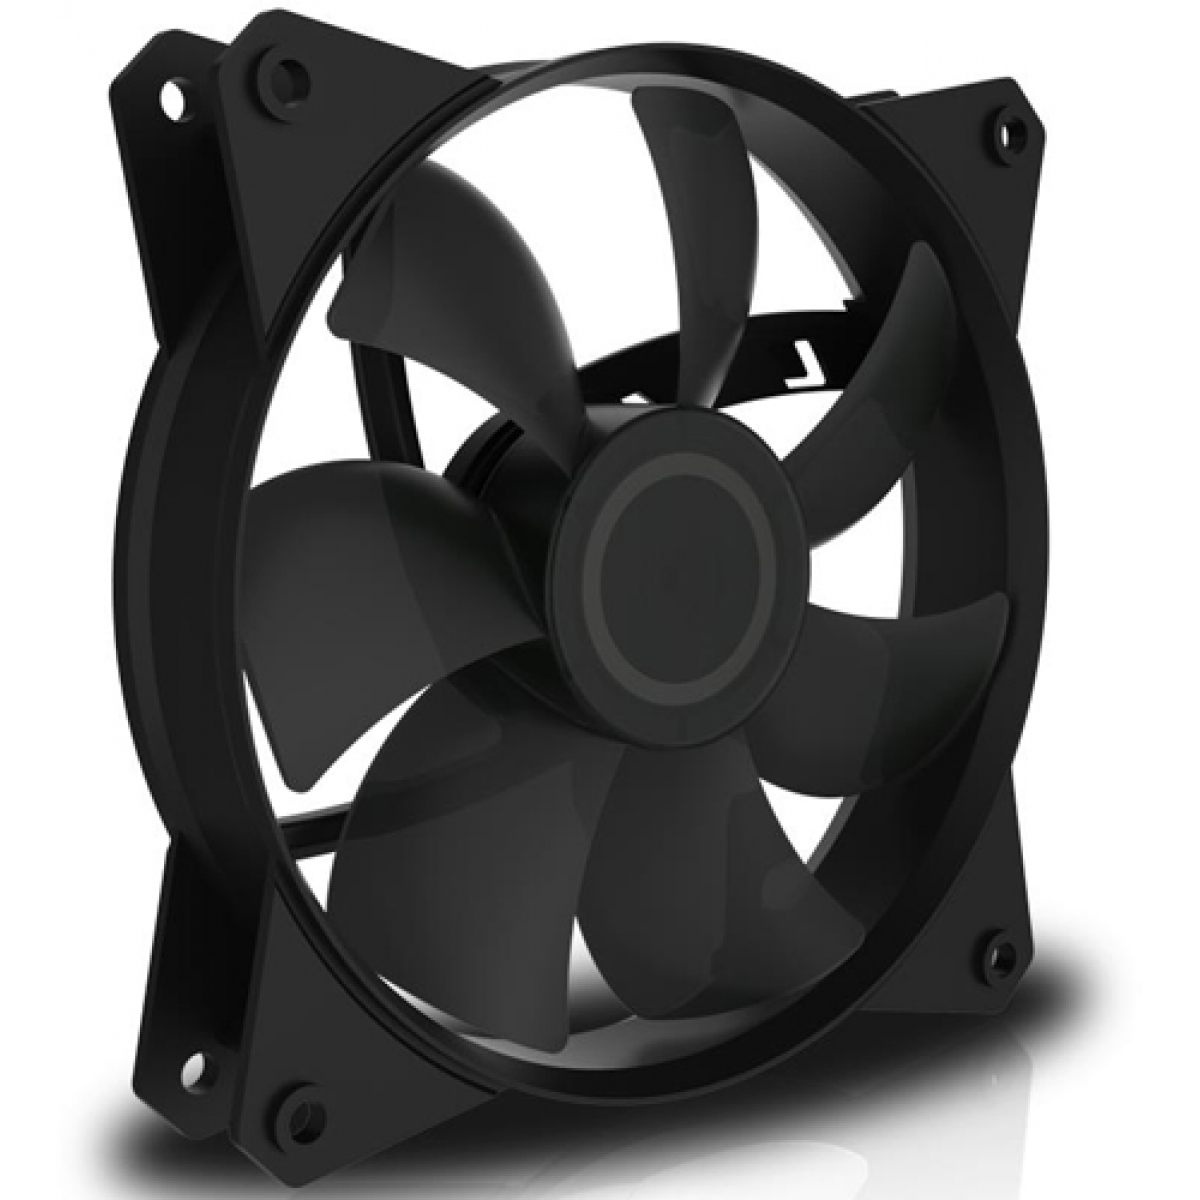 Cooler Para Gabinete Cooler Master Masterfan MF120L, 120mm, R4-C1DS-12FK-R1